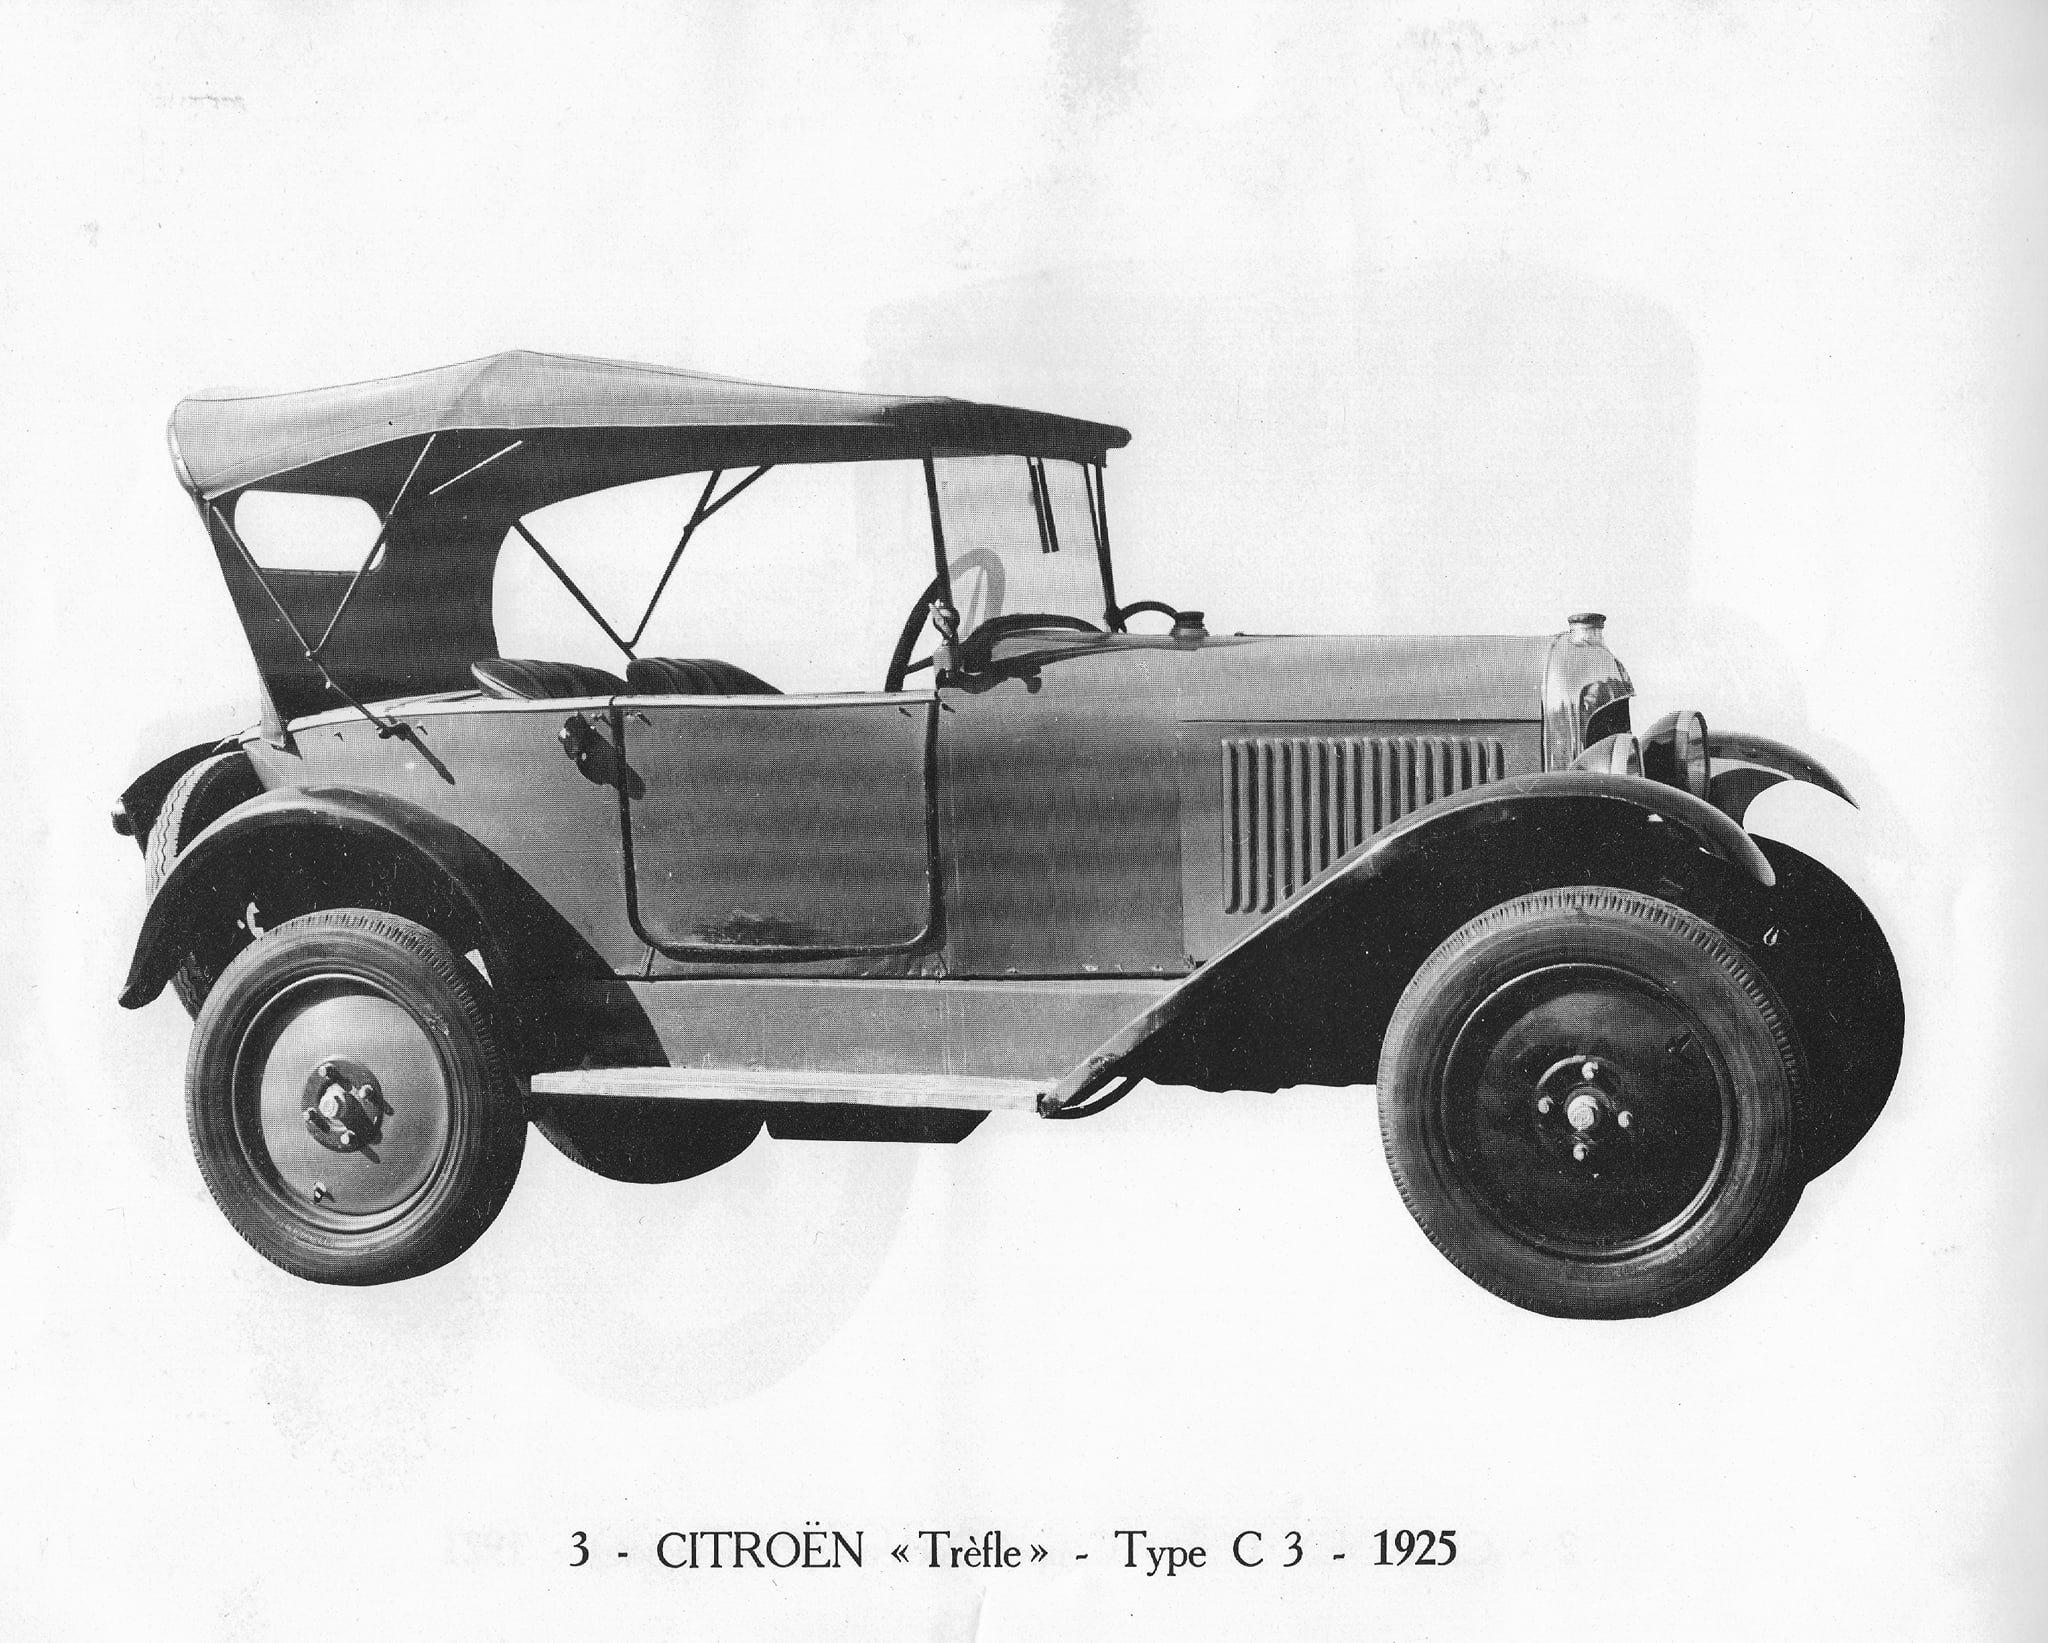 Citroen-C3-1925-